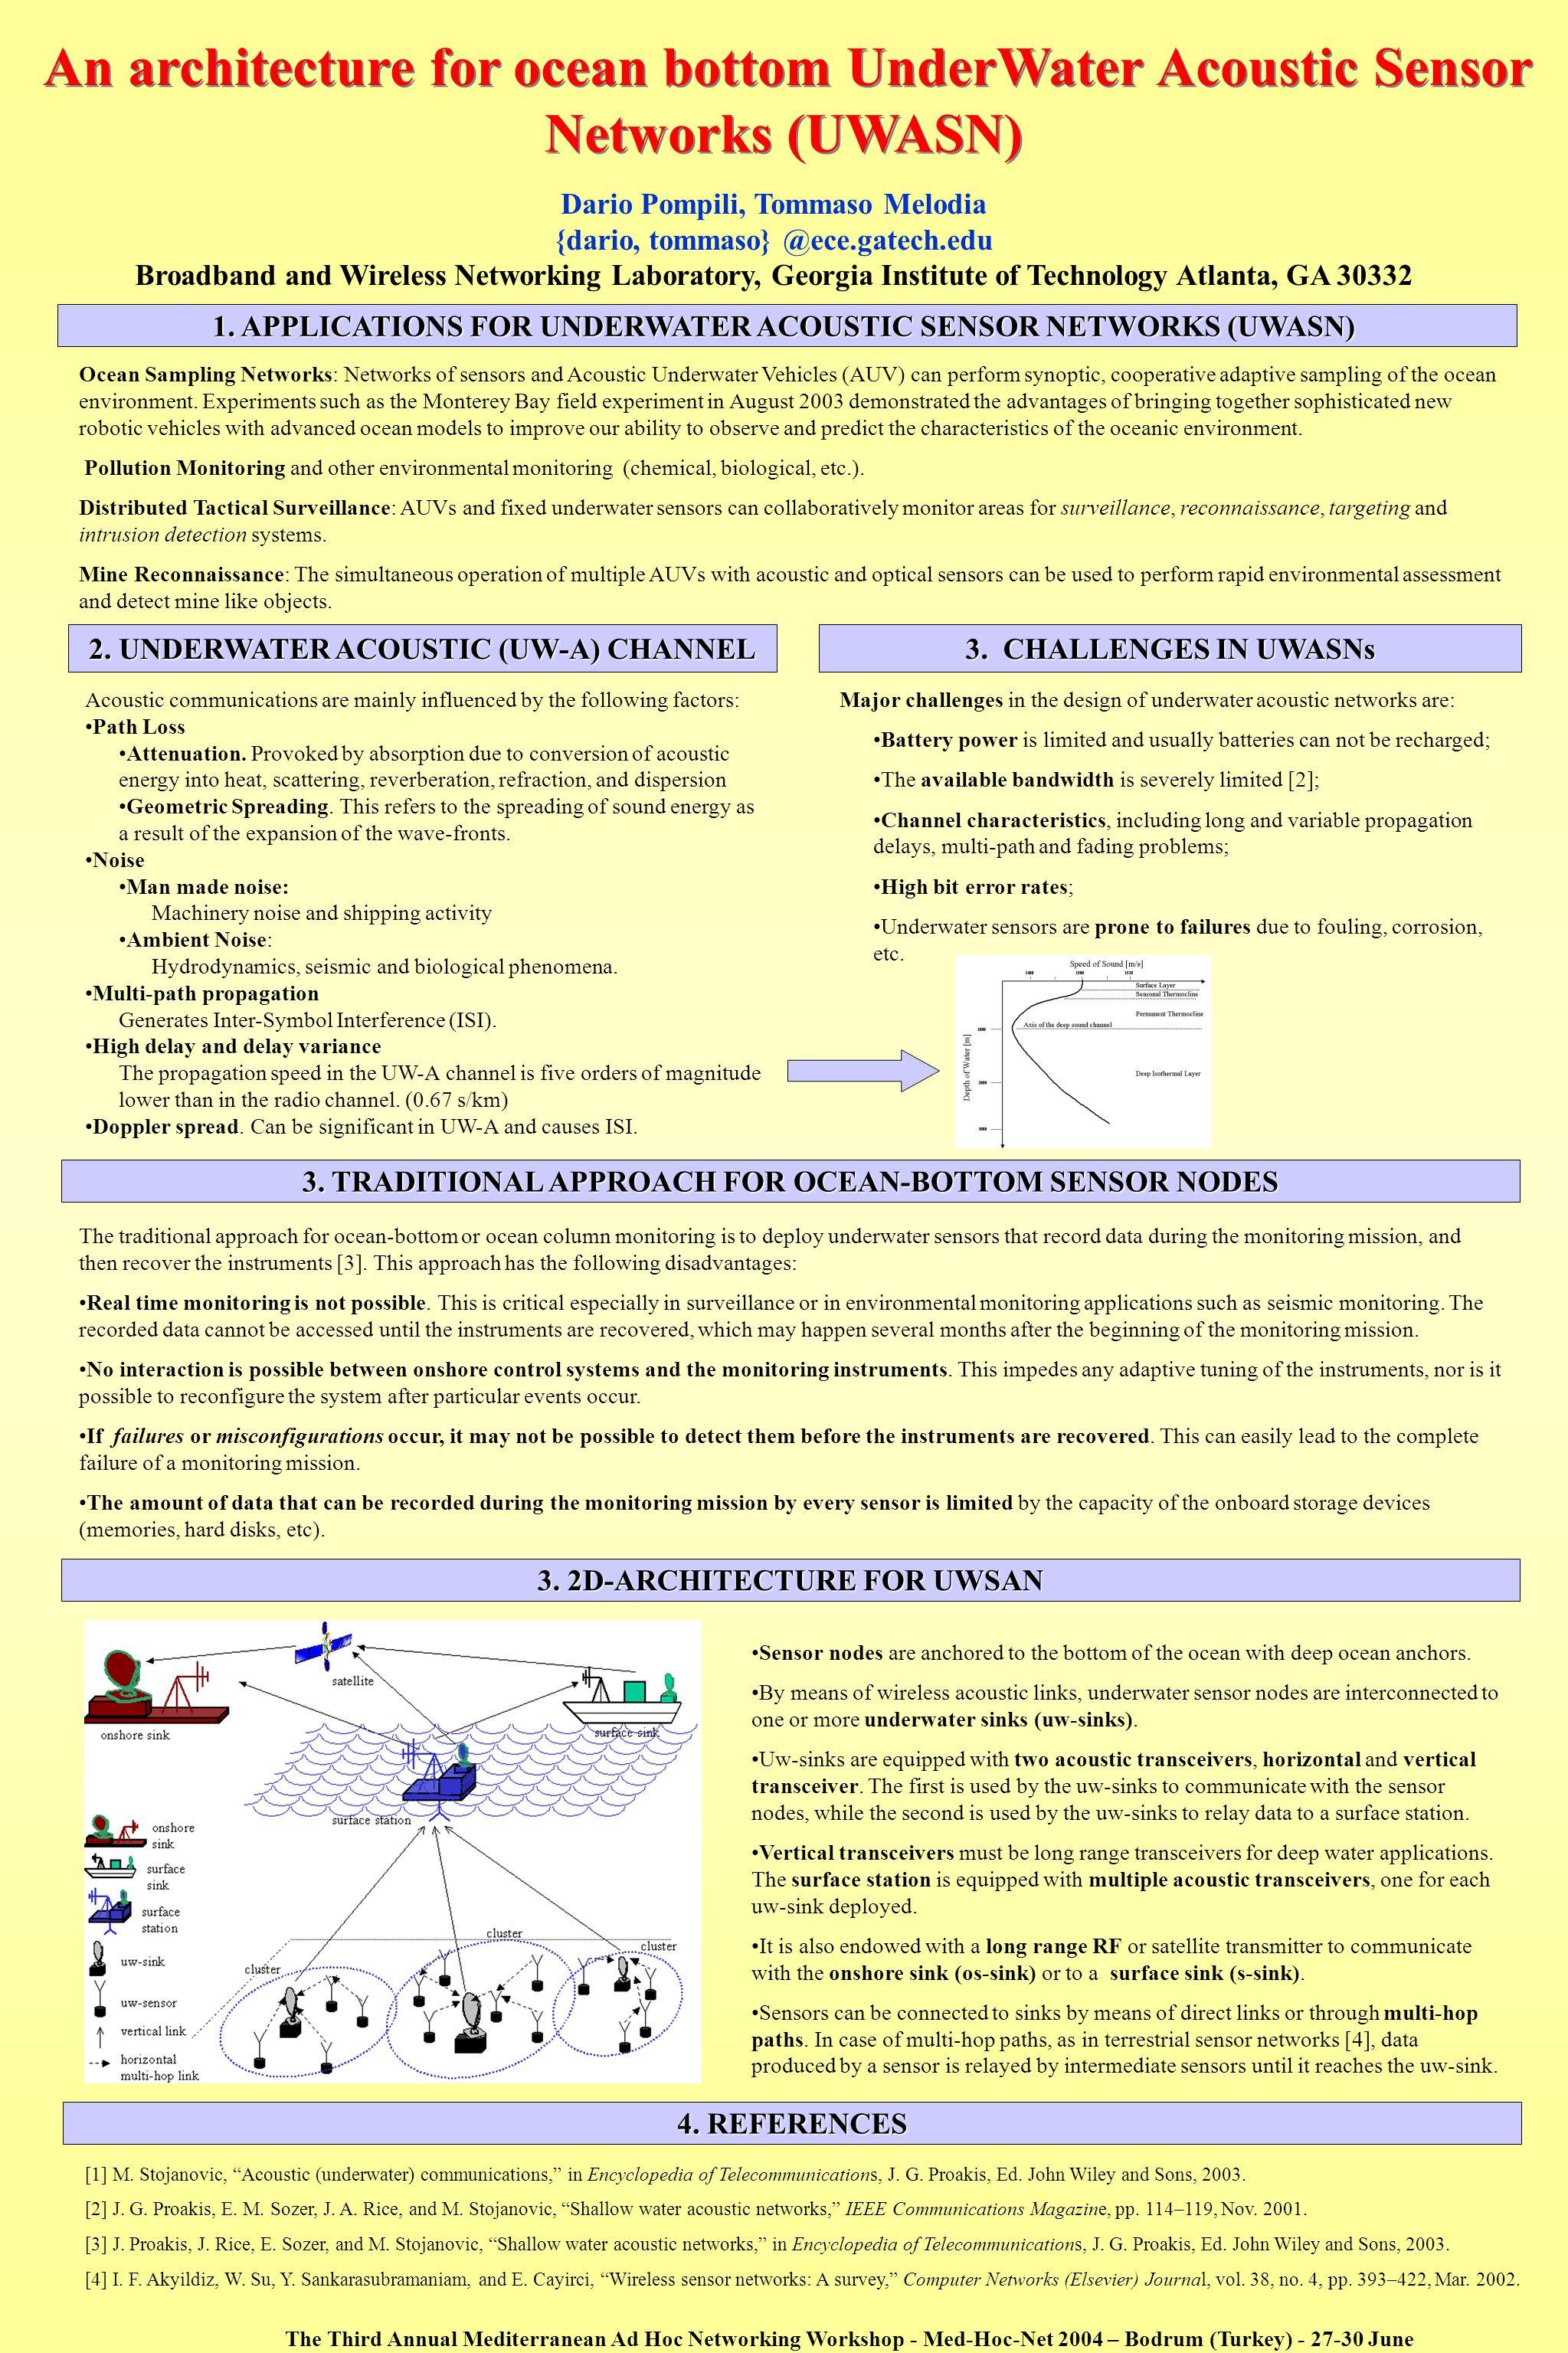 An architecture for ocean bottom UnderWater Acoustic Sensor Networks (UWASN)